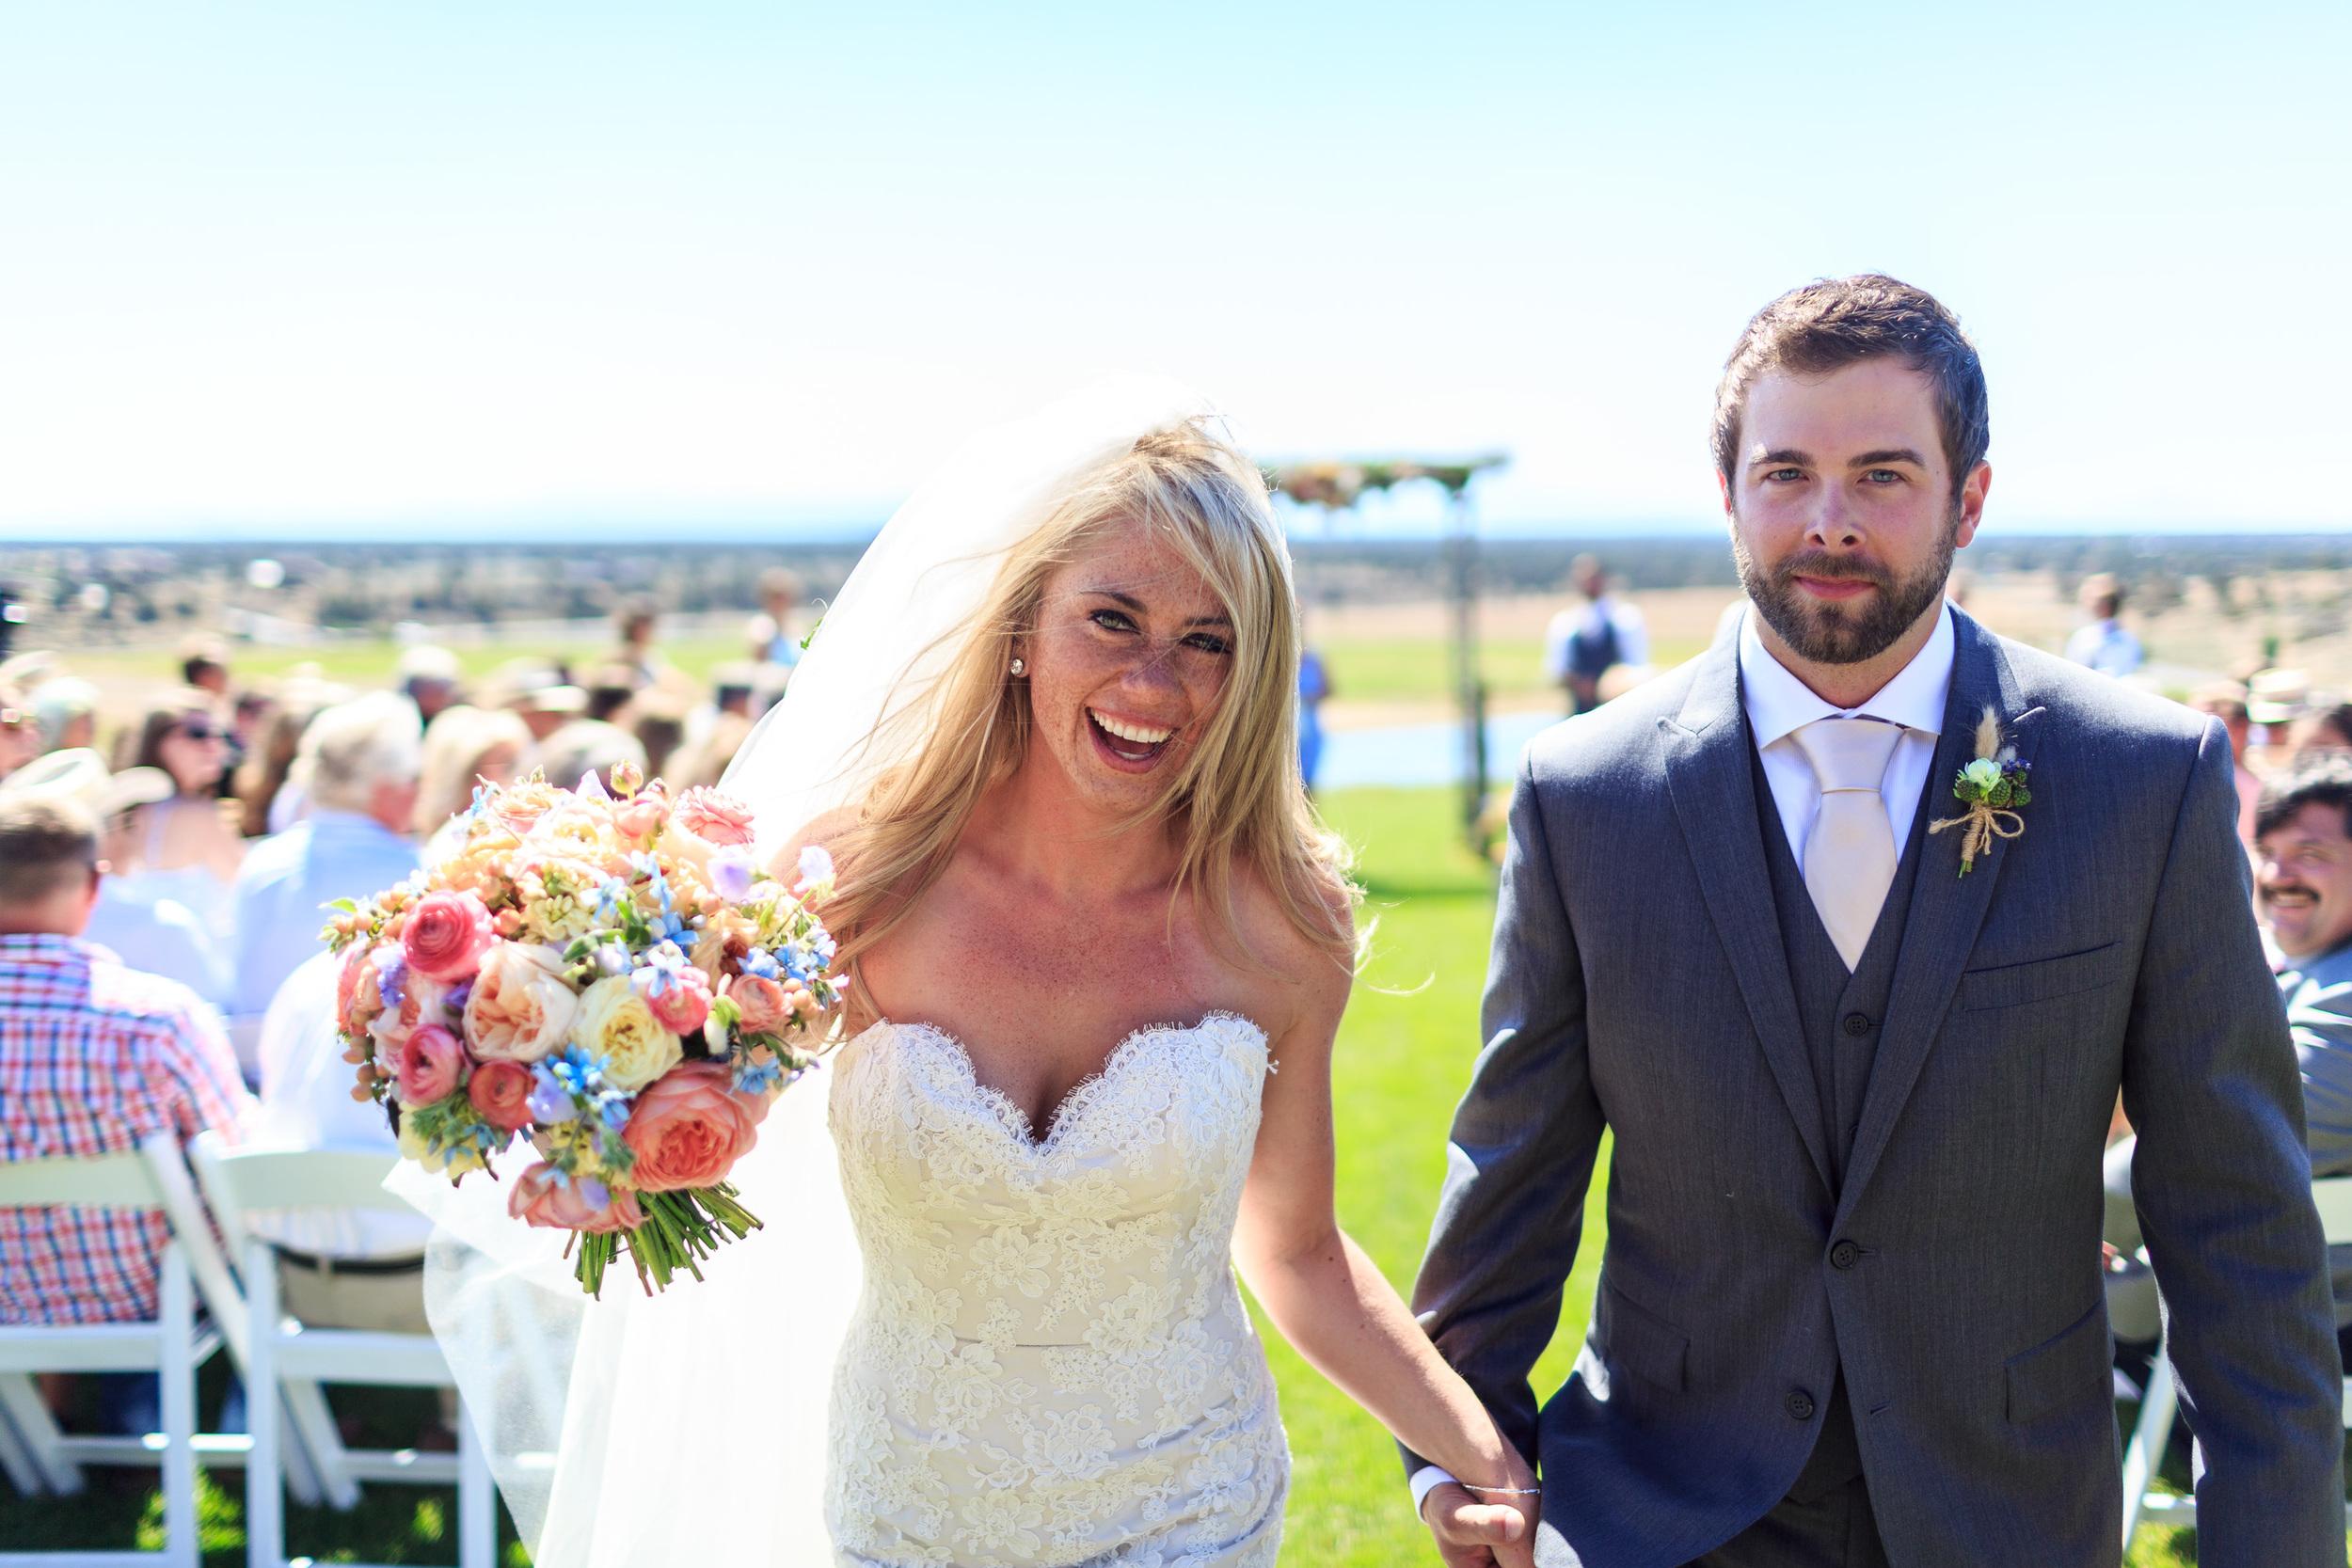 Heirloom Floral Design - Bend Weddings - Flowers to Hold Brasada Ranch -Bridal Bliss- destination wedding july farmer florist-locally grown.jpg